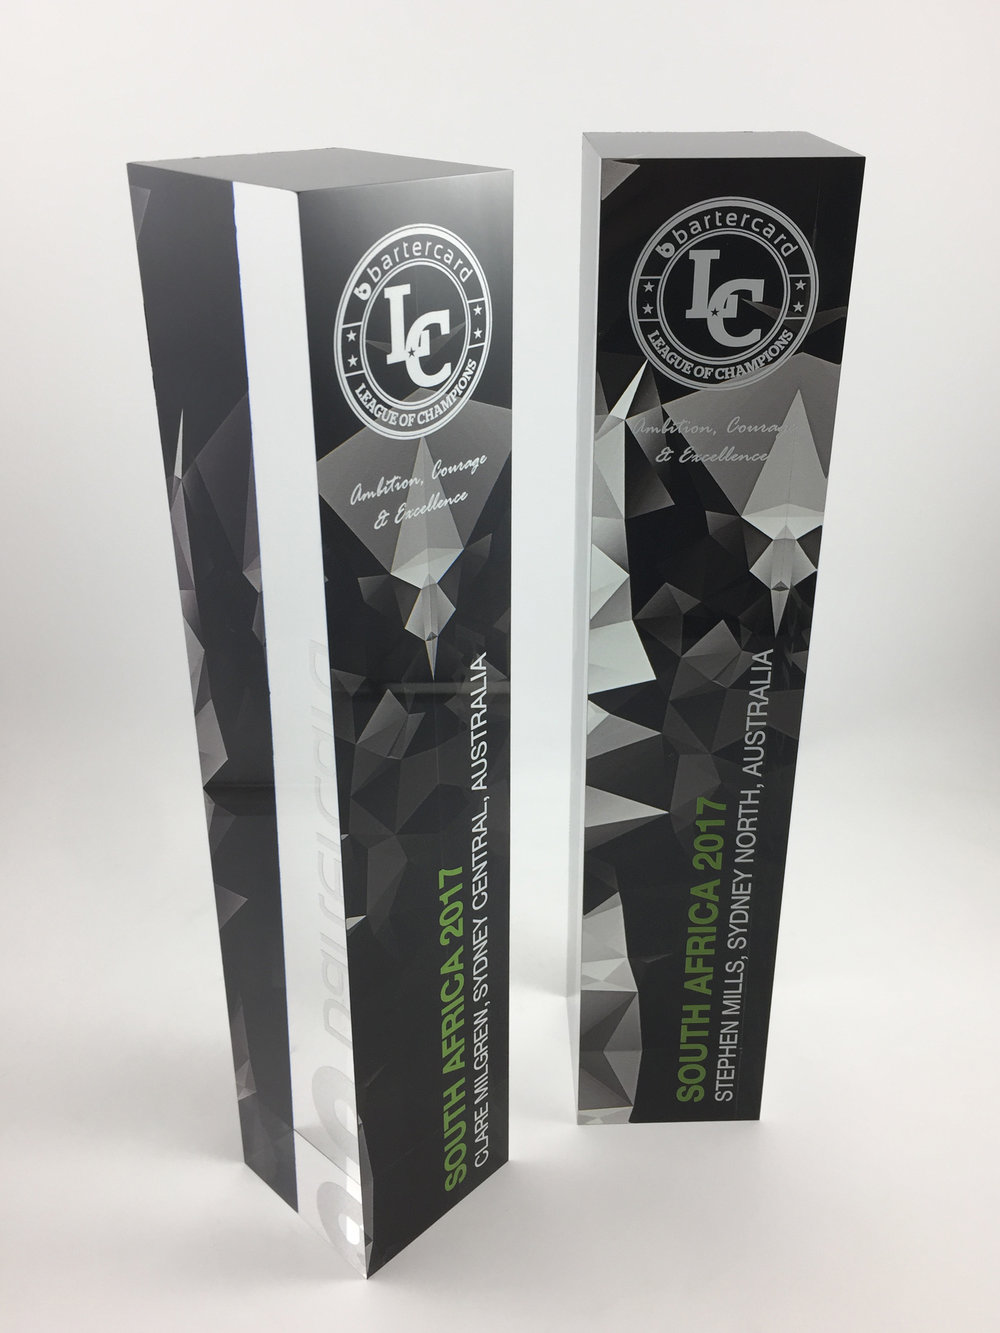 bartercard-acrylic-awards-trophy-01.jpg